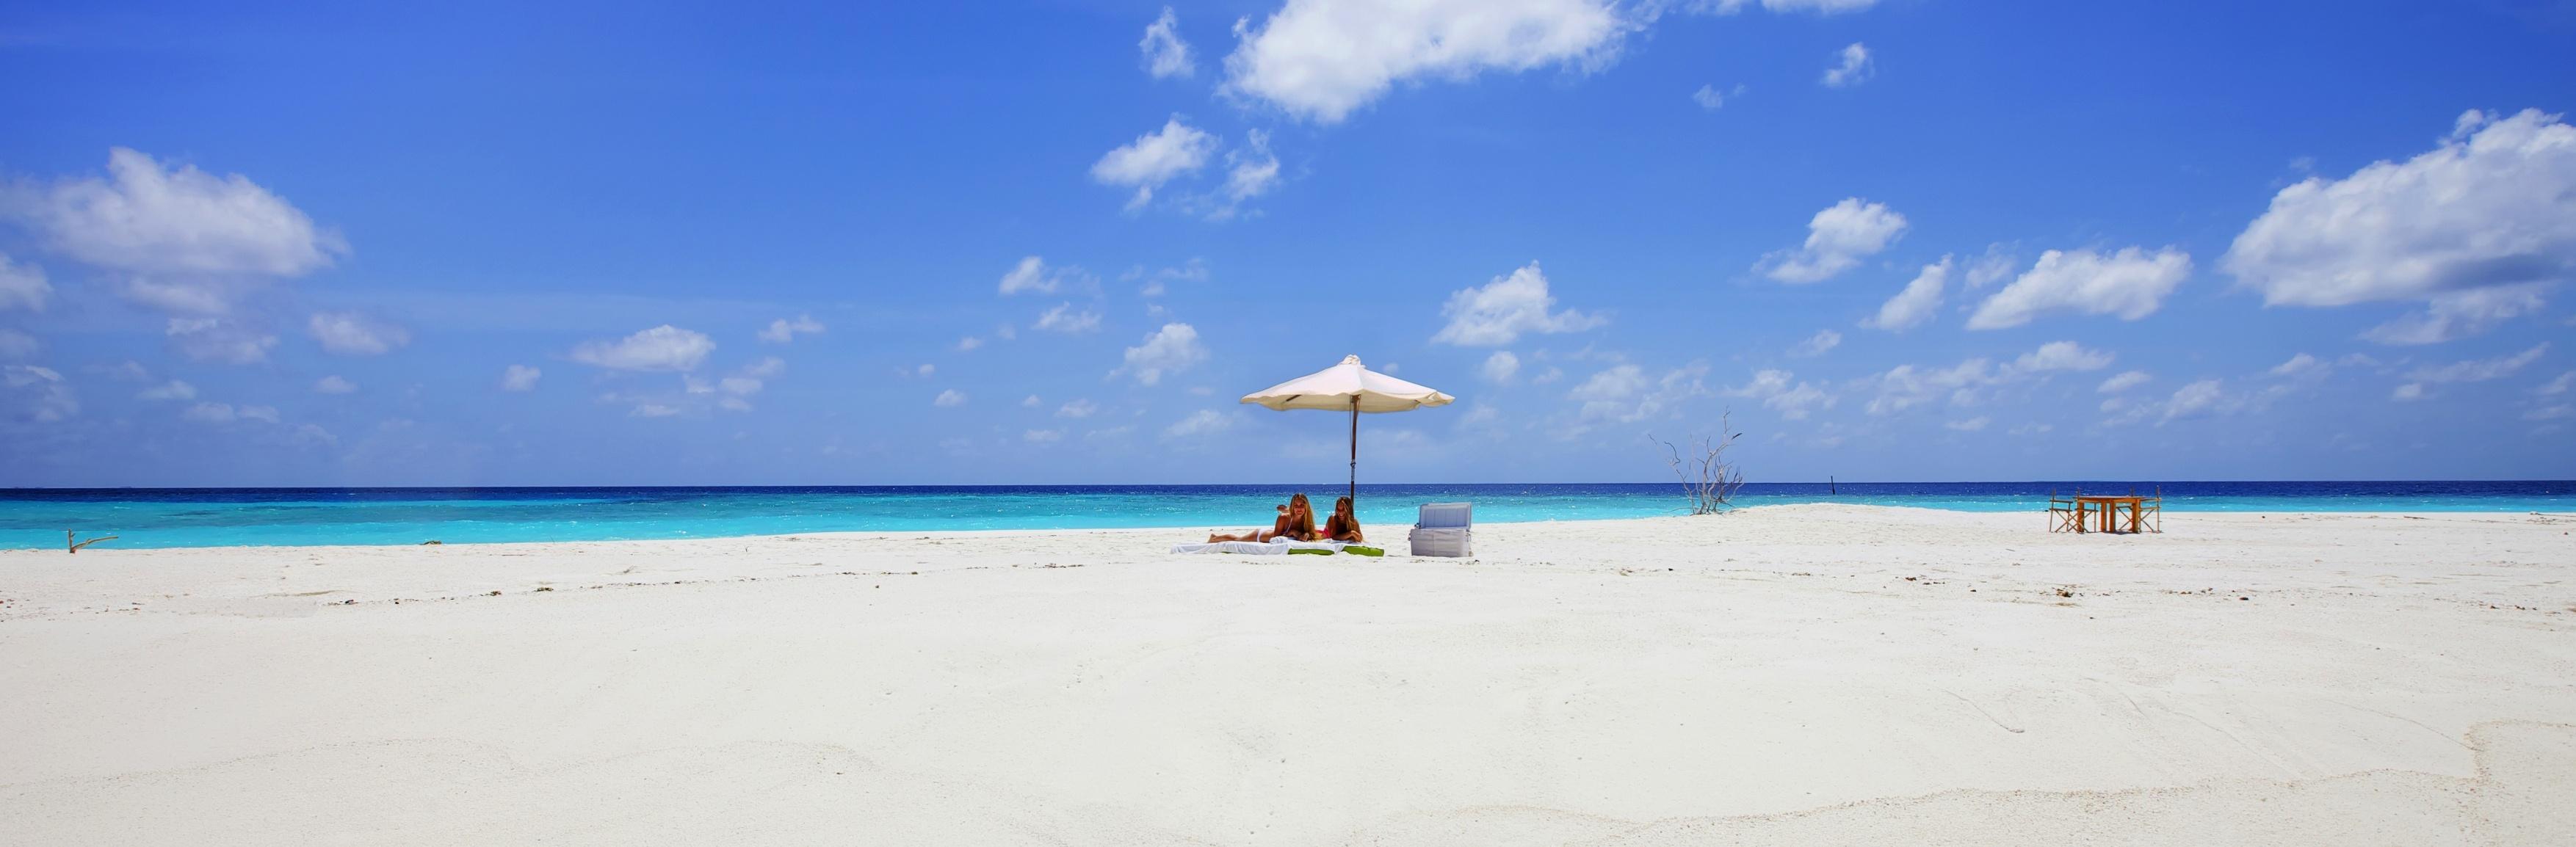 Sandbank_sunbathing_maldives